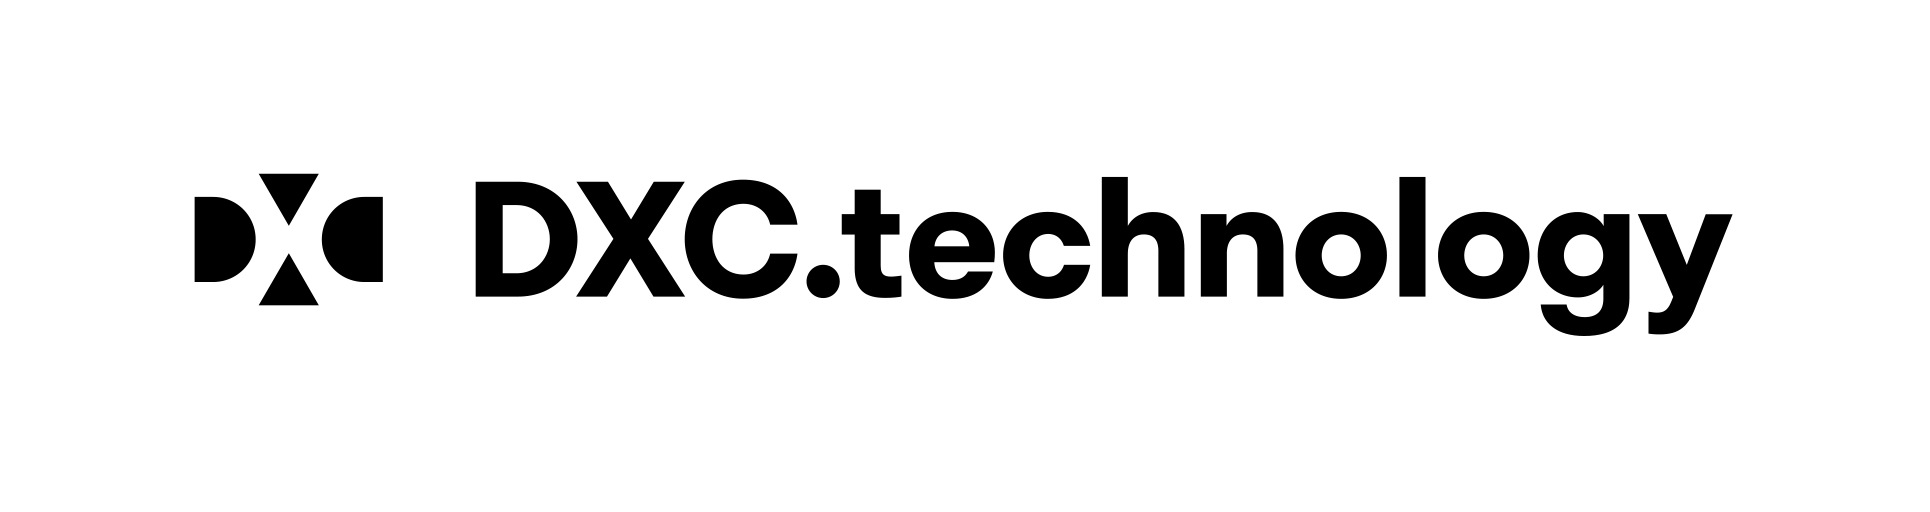 dxc_logo_hz_blk_rgb-XXSML